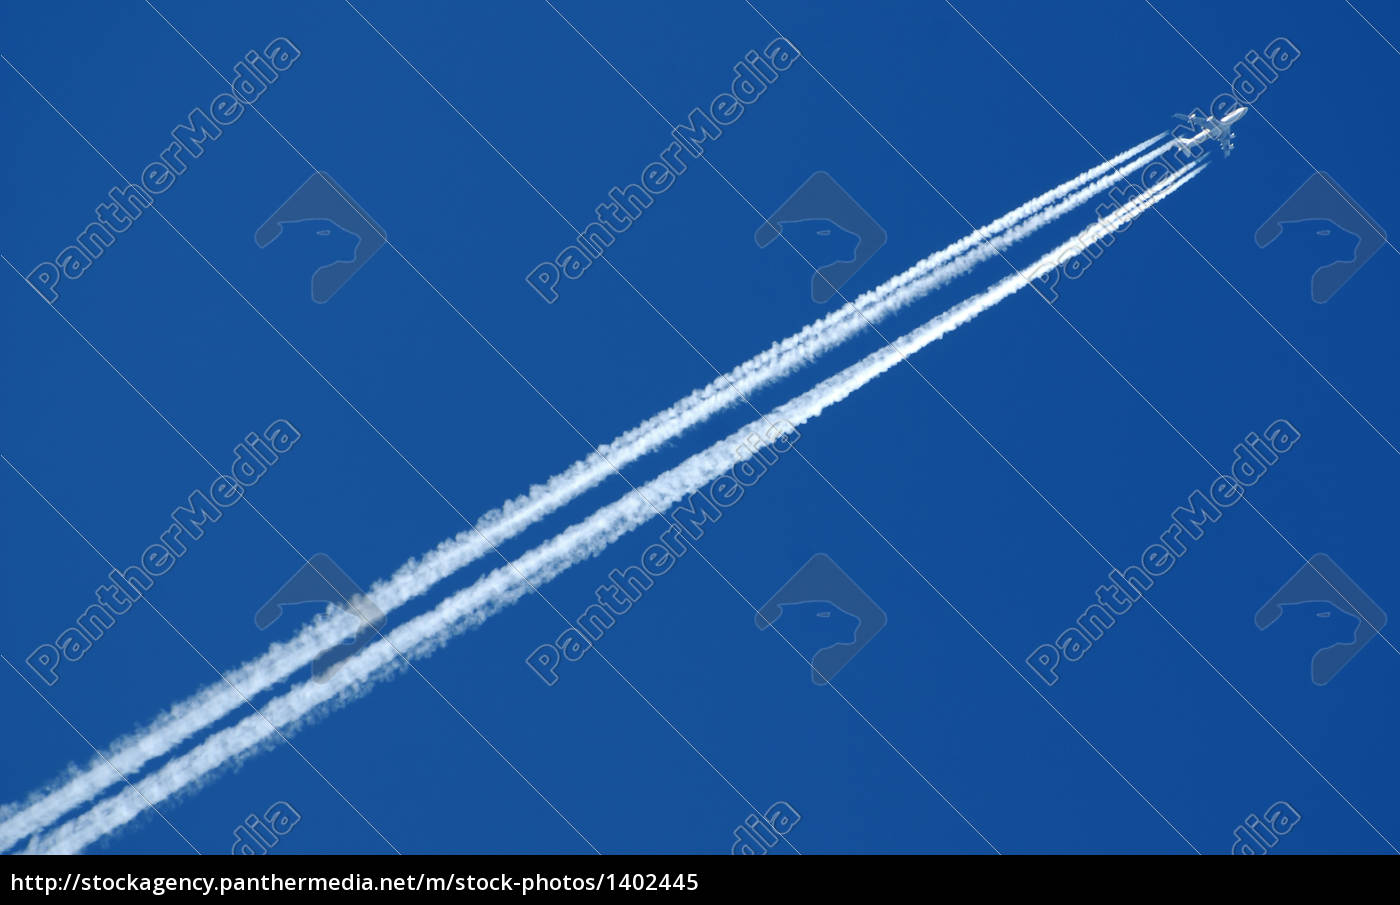 overflight - 1402445